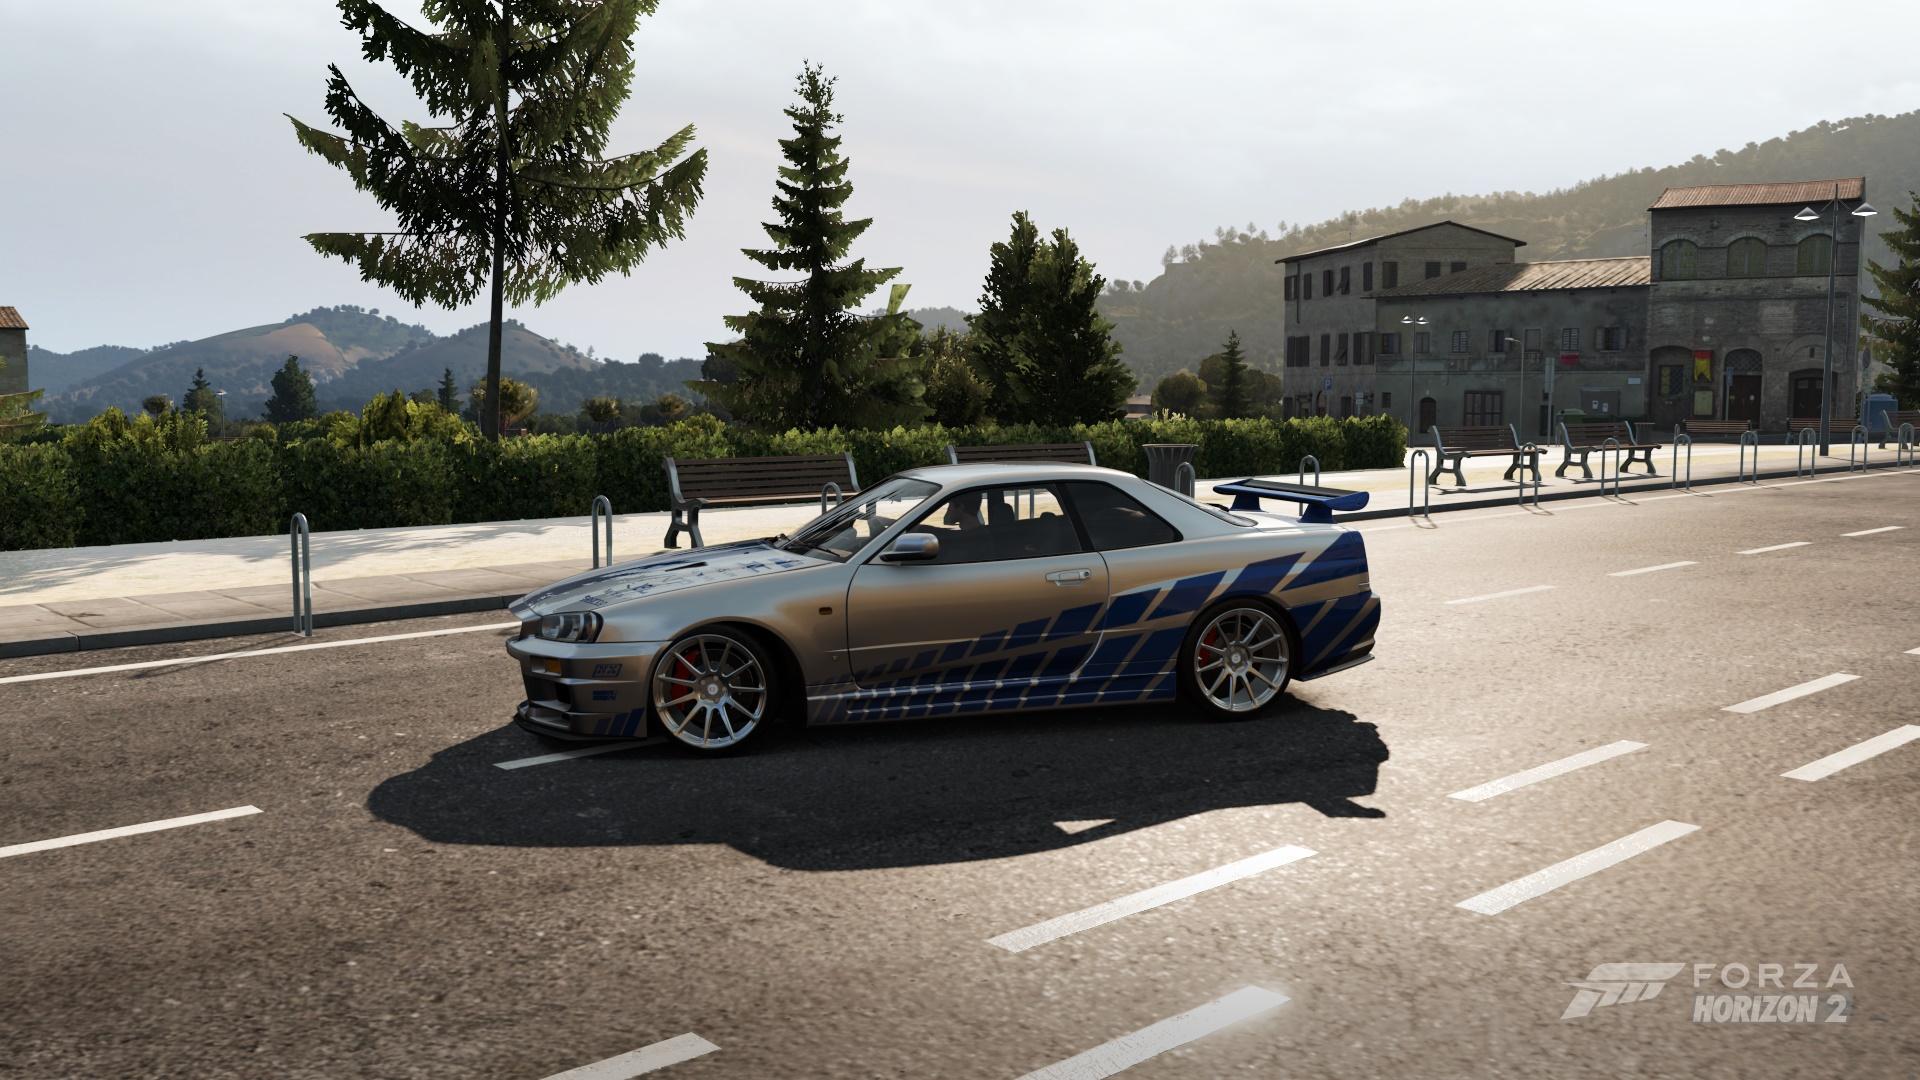 Brain S Nissan Skyline R34 Gt R In Forza Horizon 2